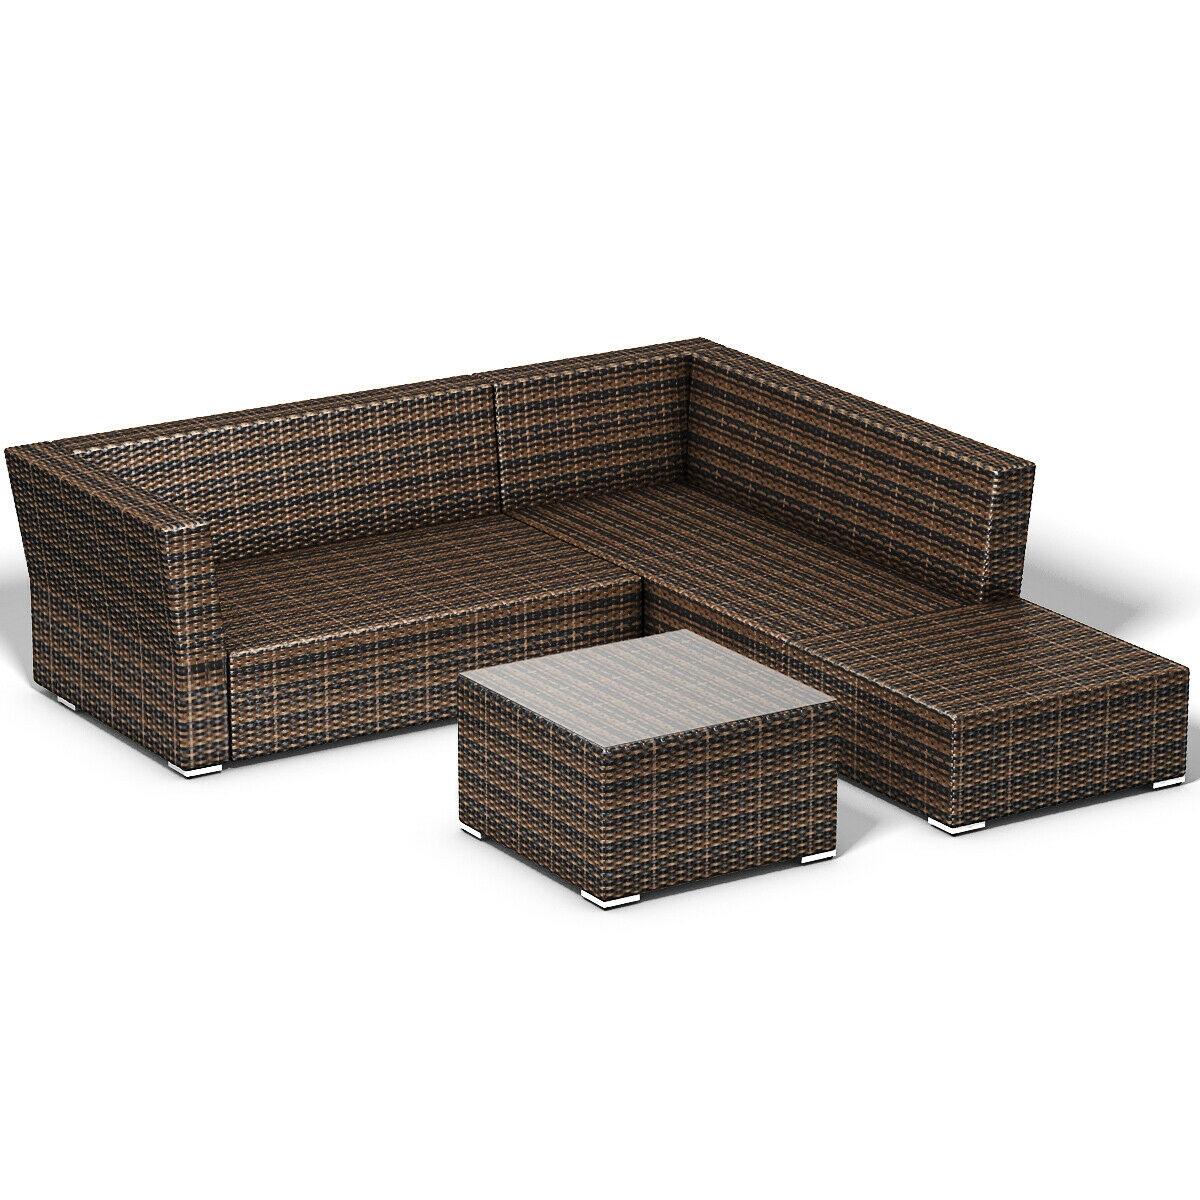 4 pcs Wicker Cushioned 5 Seat Sofa Furniture Set